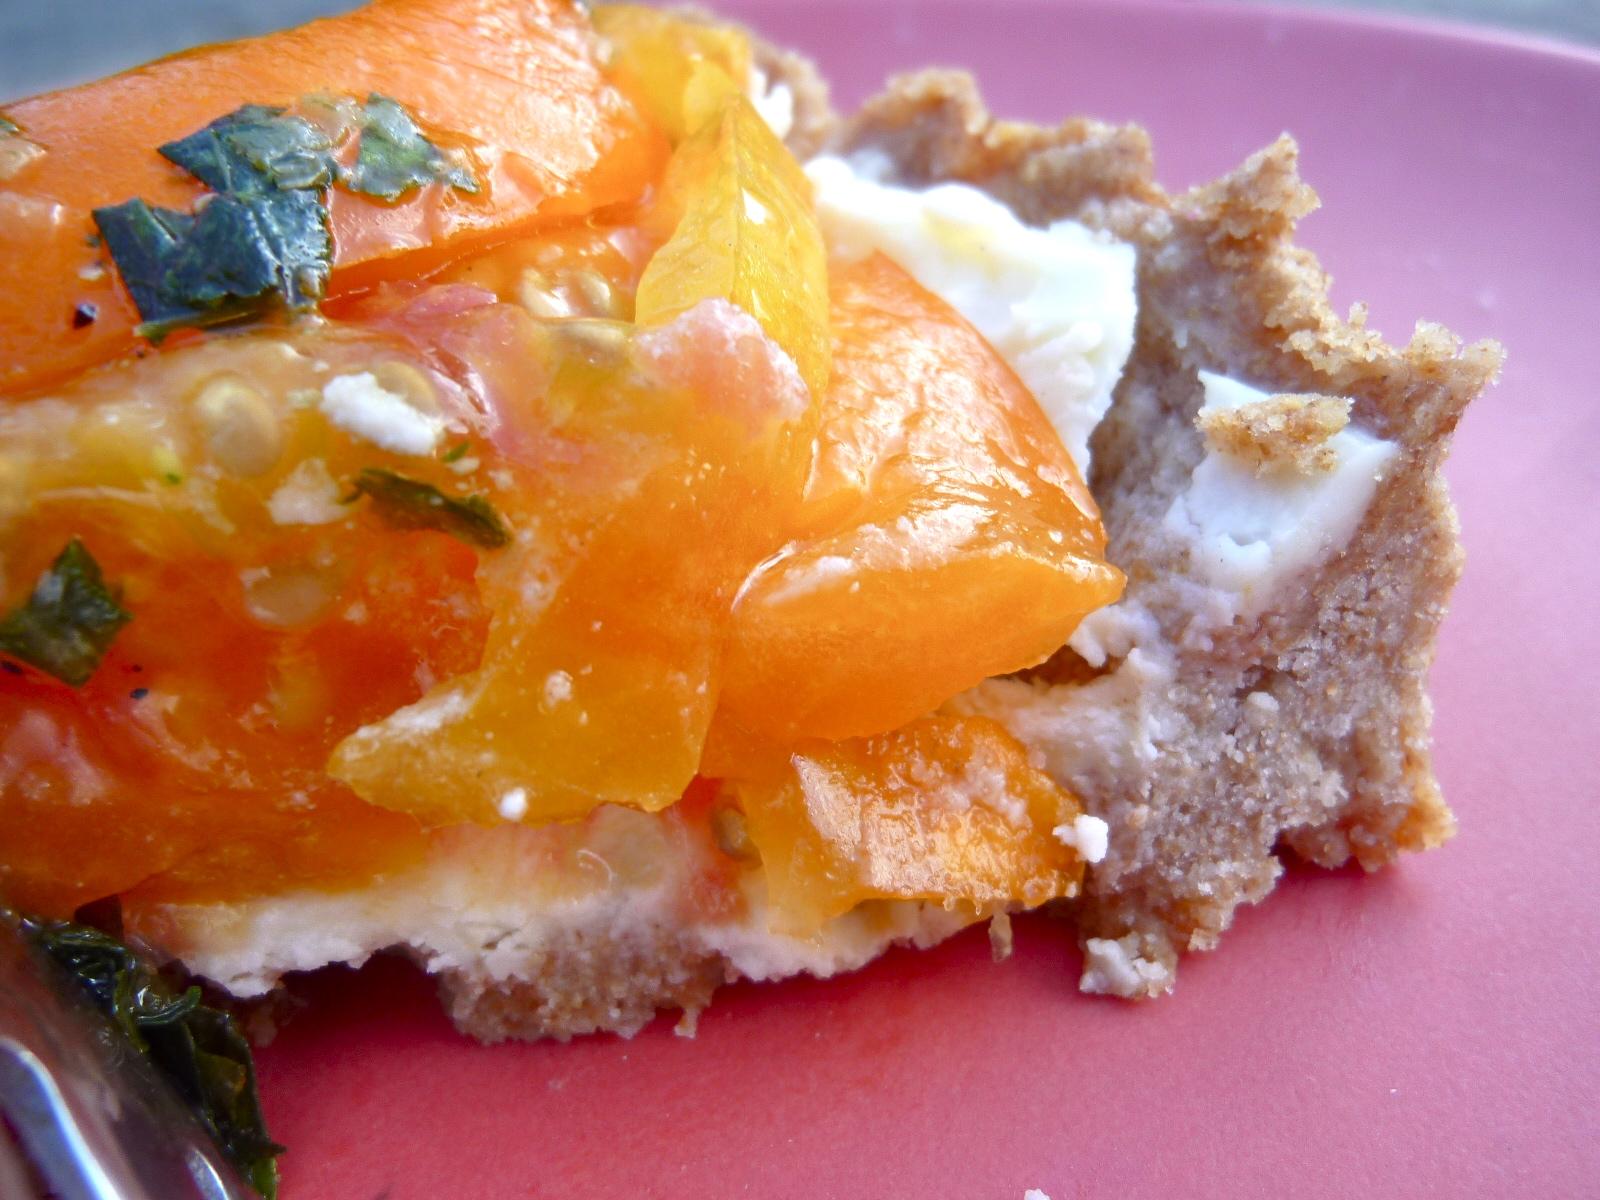 ... Mad Hausfrau: Heirloom Tomato Tart with Whole Wheat Parmesan Crust